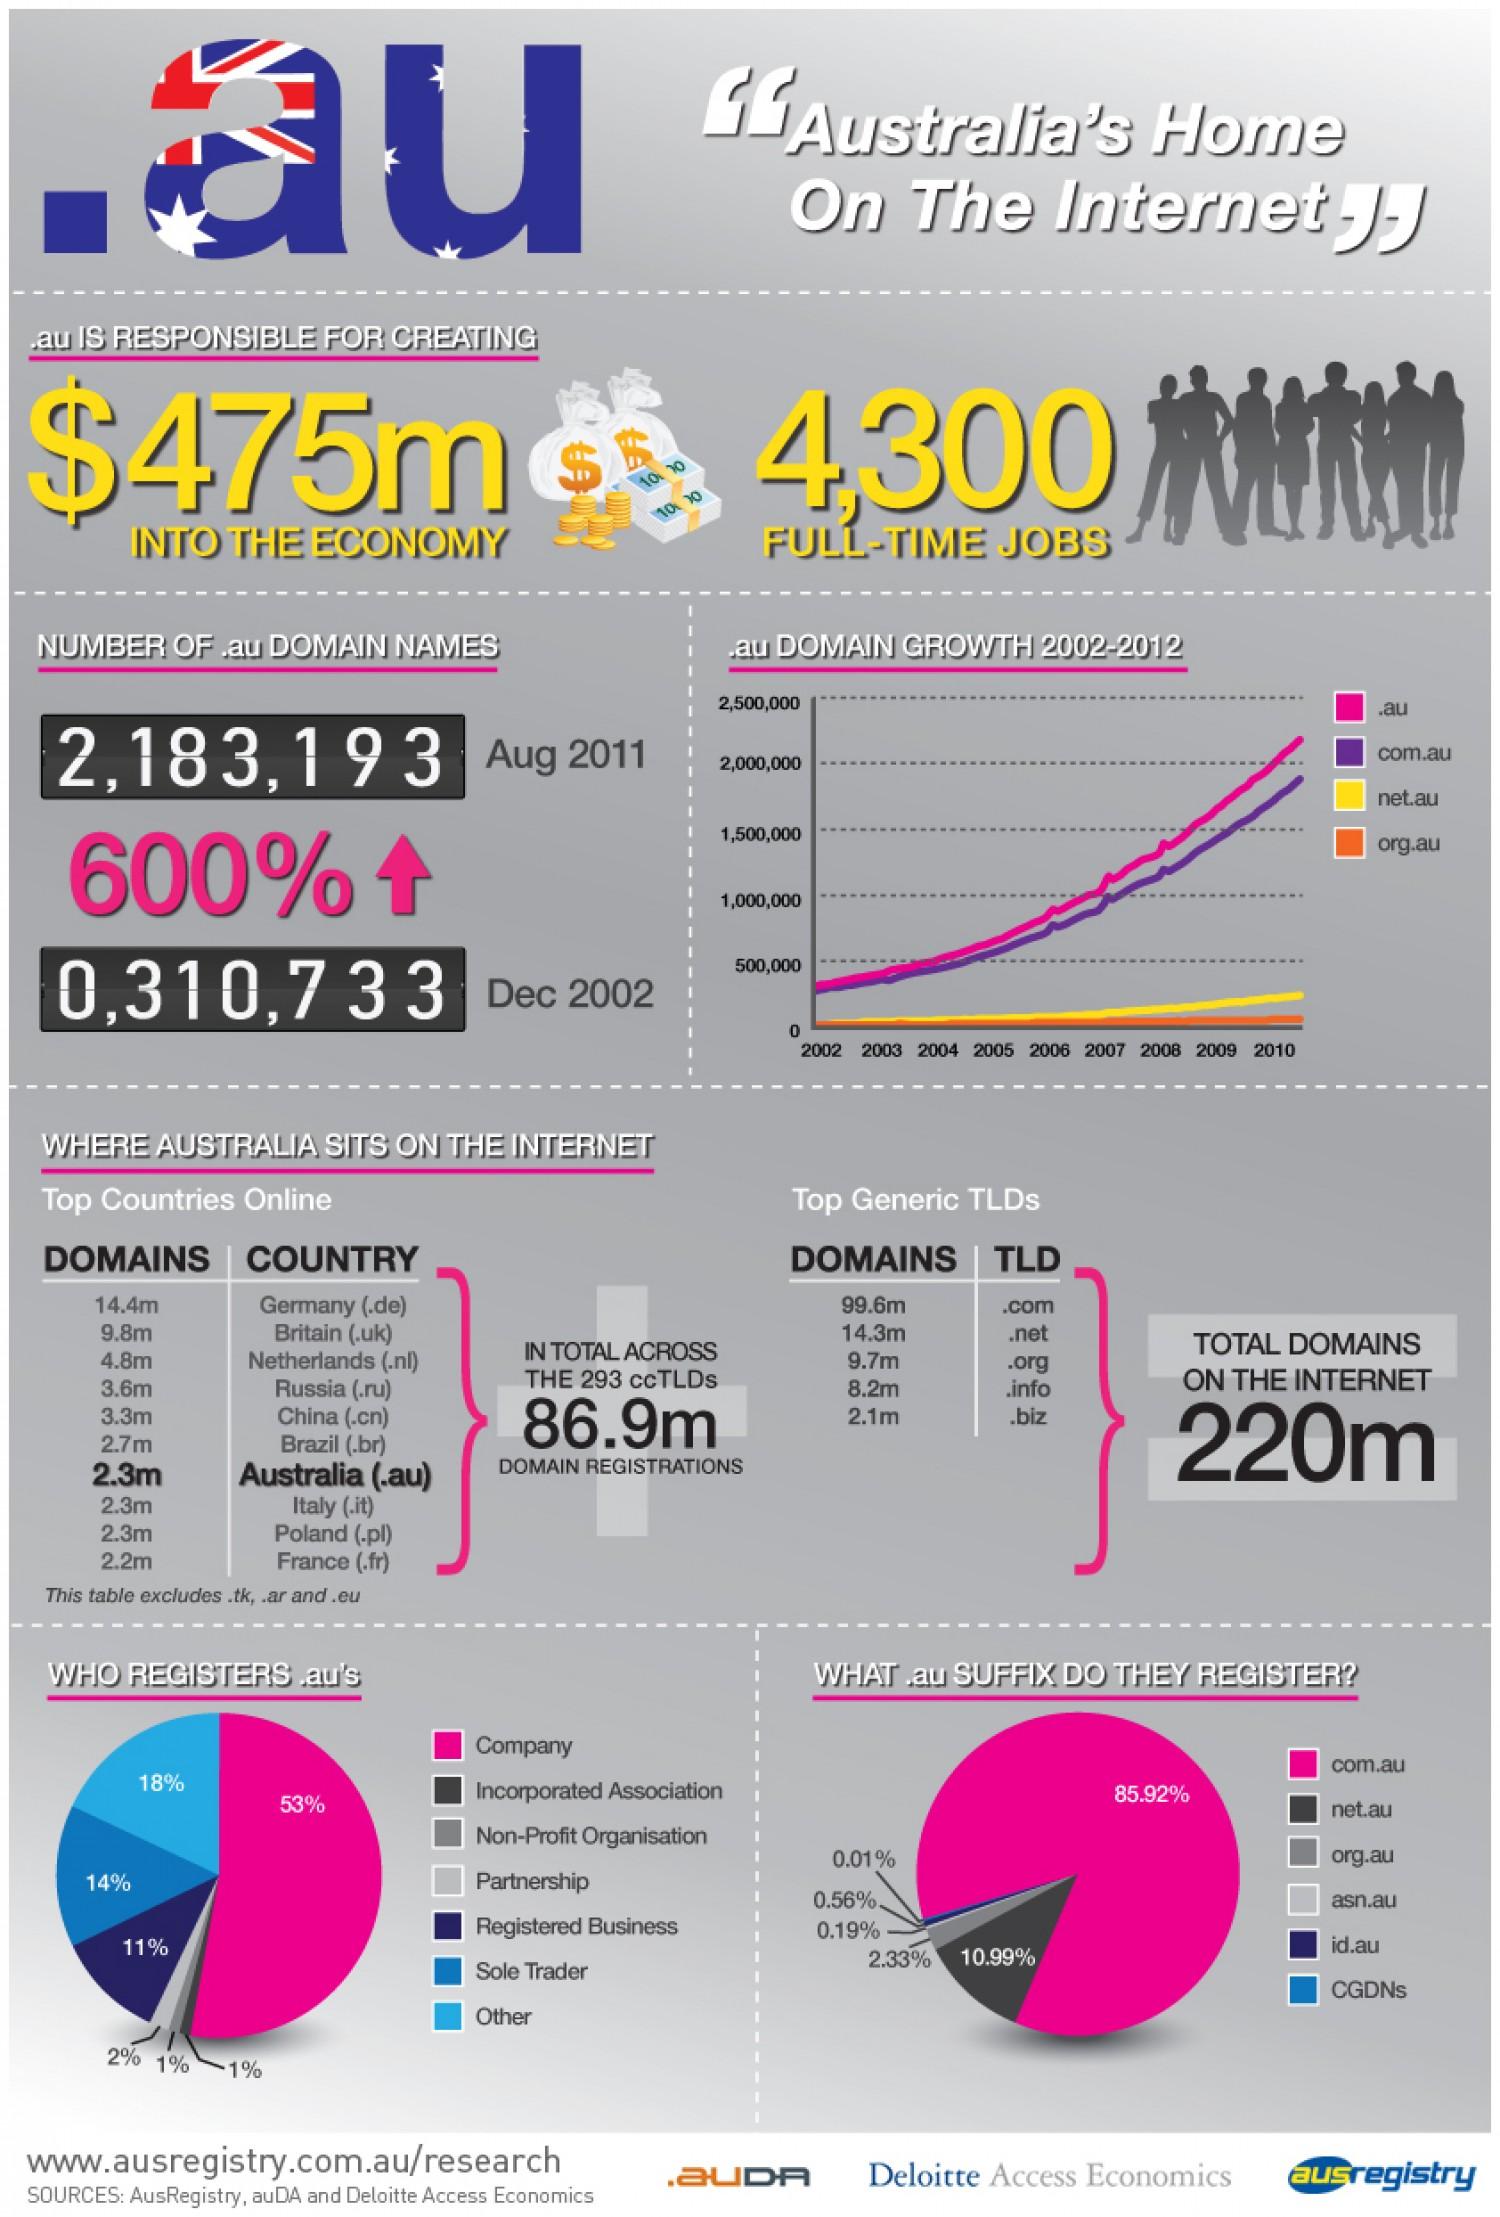 4. Australia and Internet